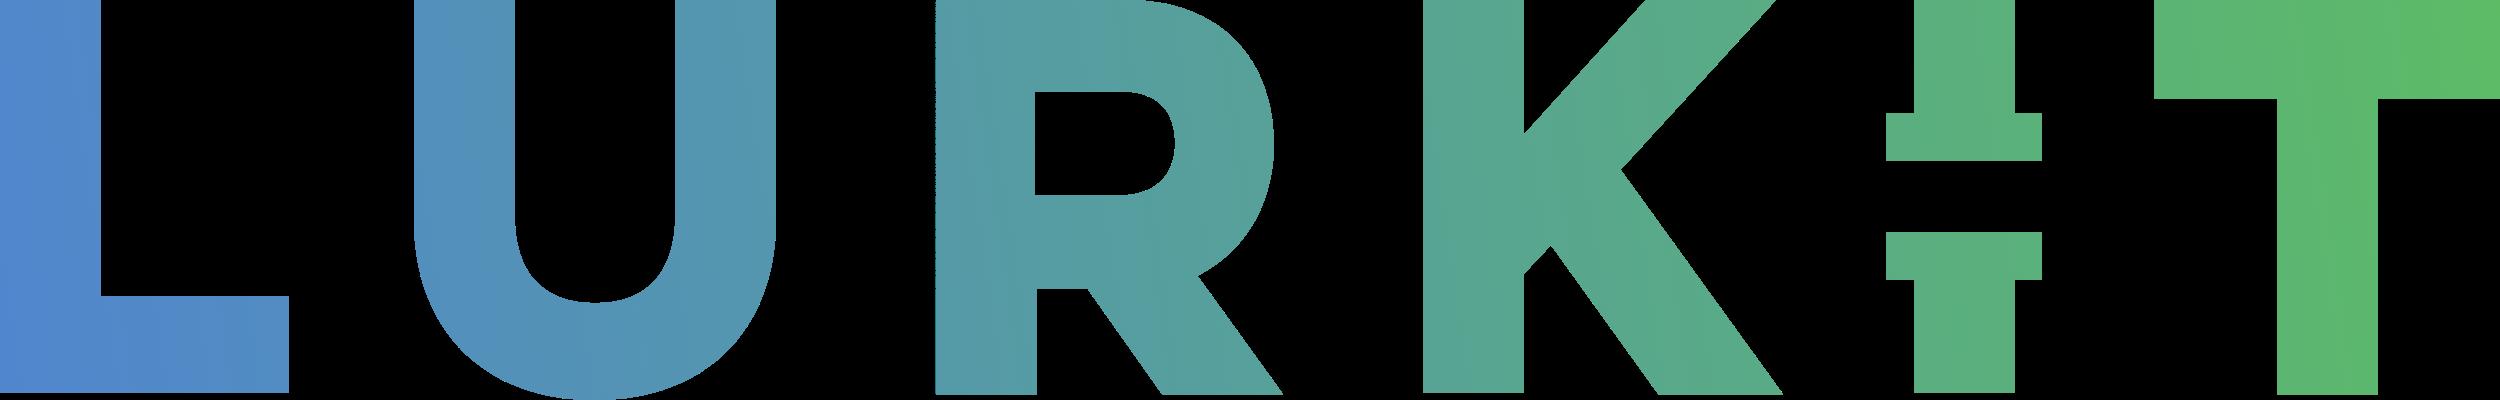 Lurkit_logo2500